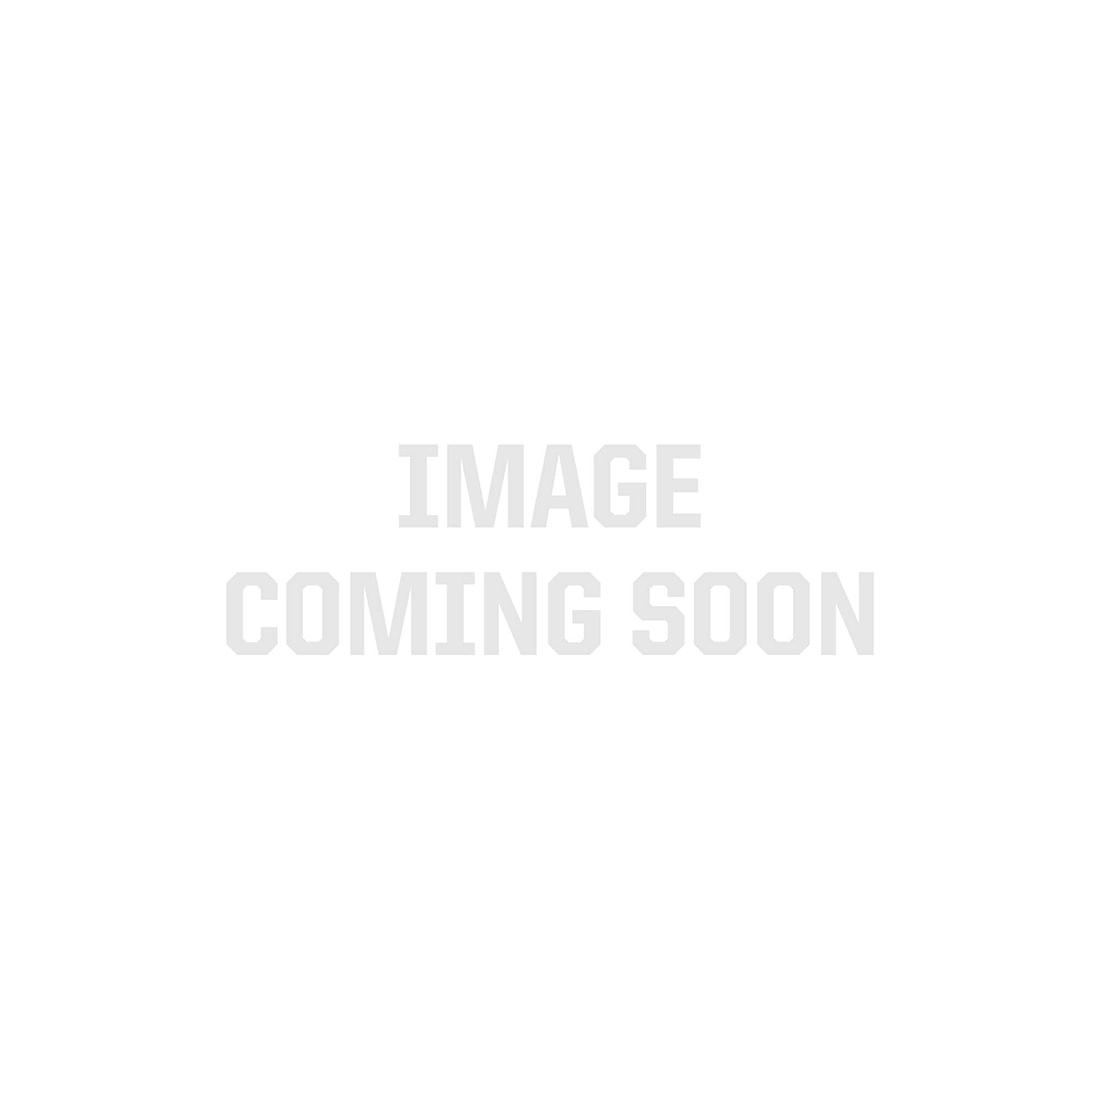 TruColor 2835 CurrentControl LED Strip Light - 4,000K - 160/m - CurrentControl - Sample Kit